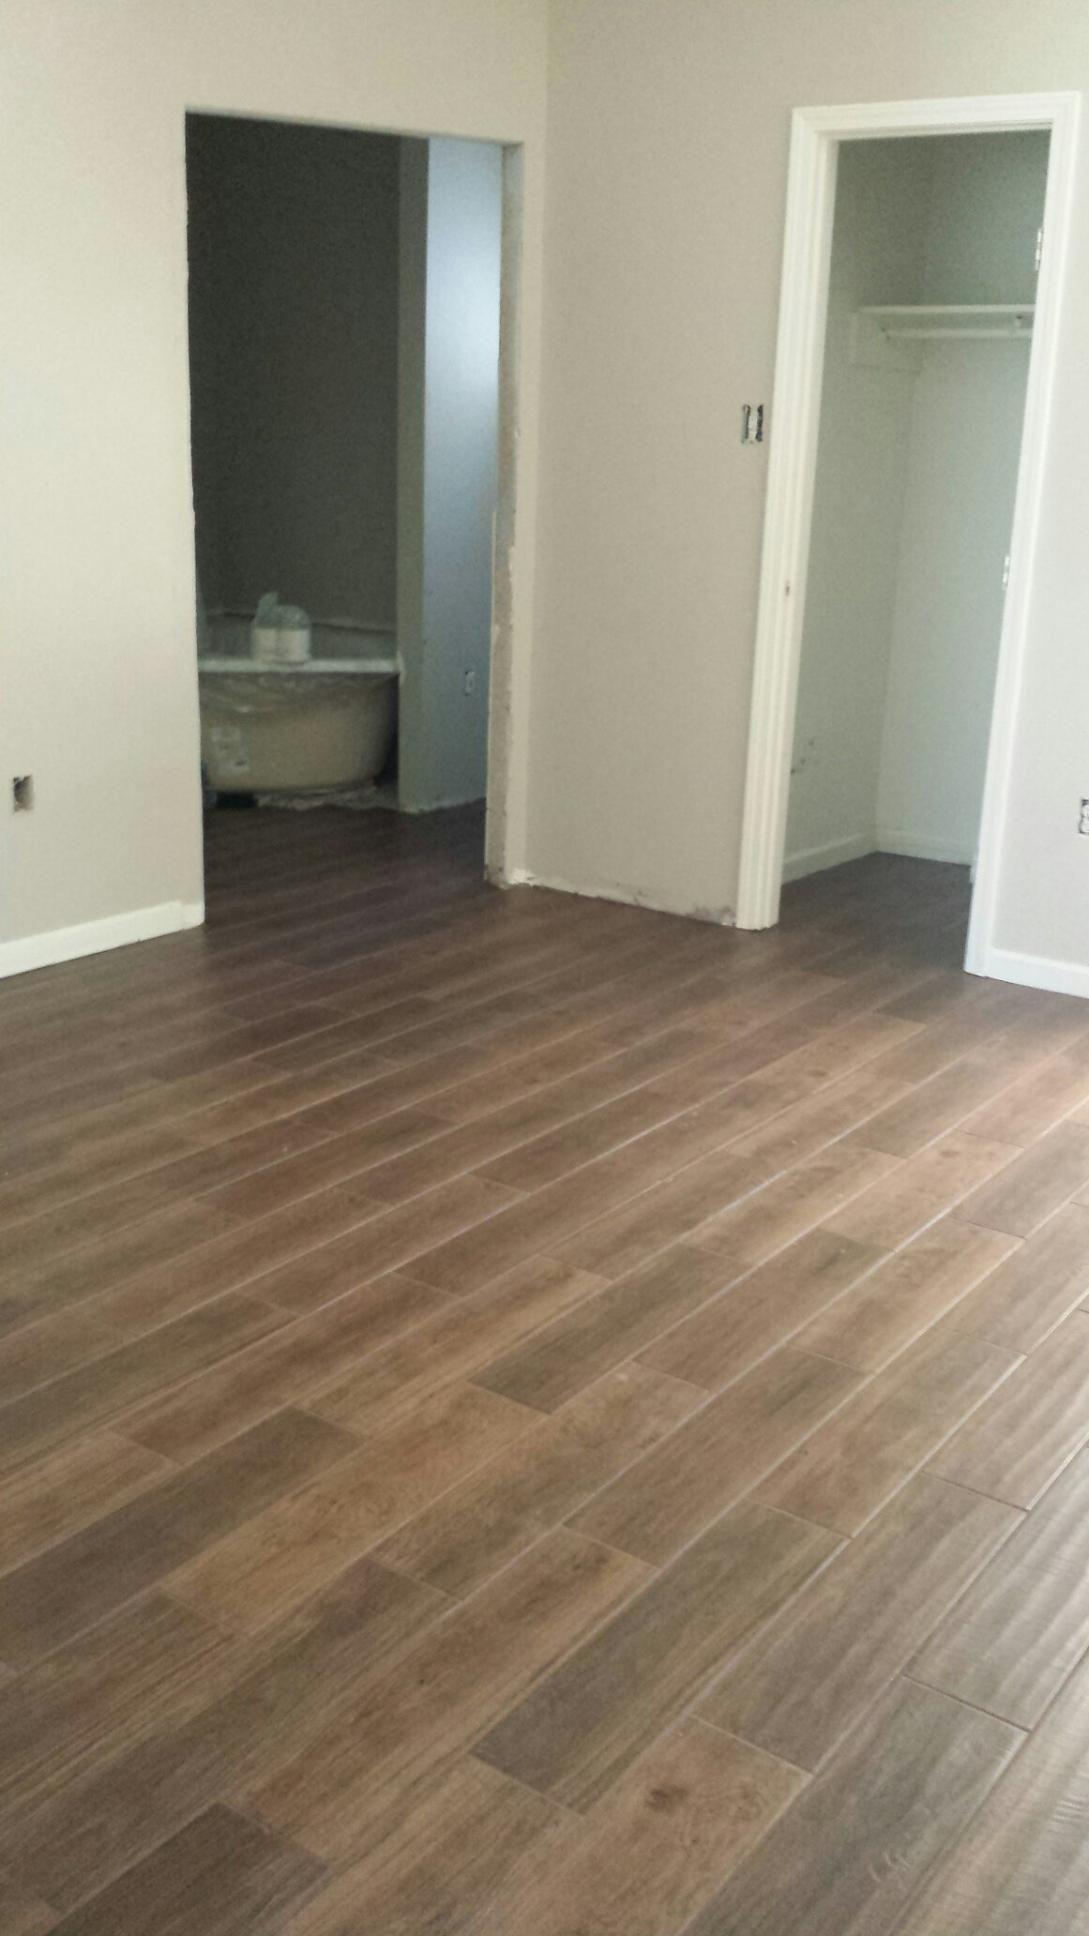 Wip Hardwood Styled Porcelain Tile Flooring Throughout Whole House